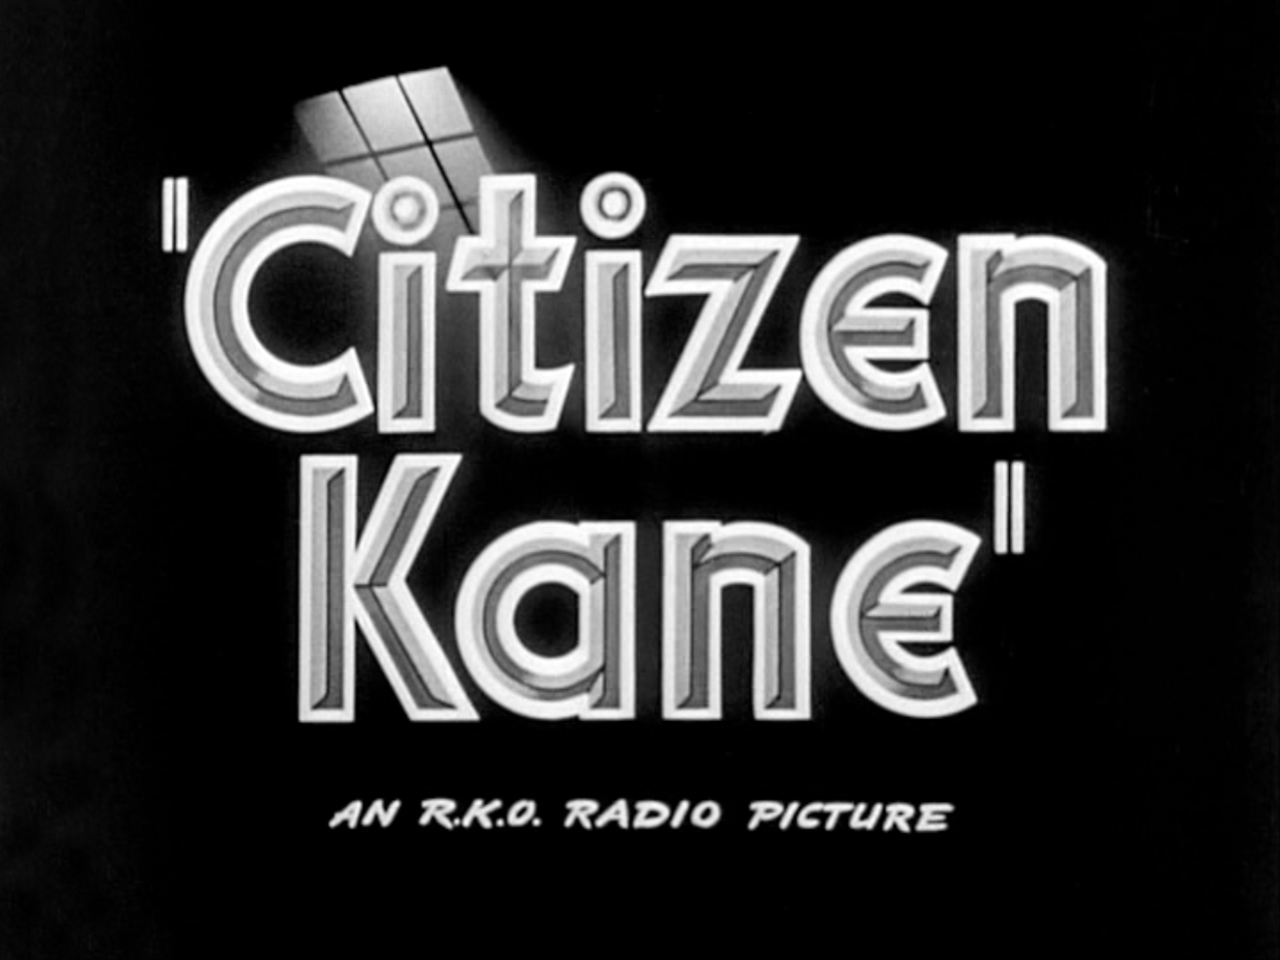 Citizen Kane trailer - Wikipedia